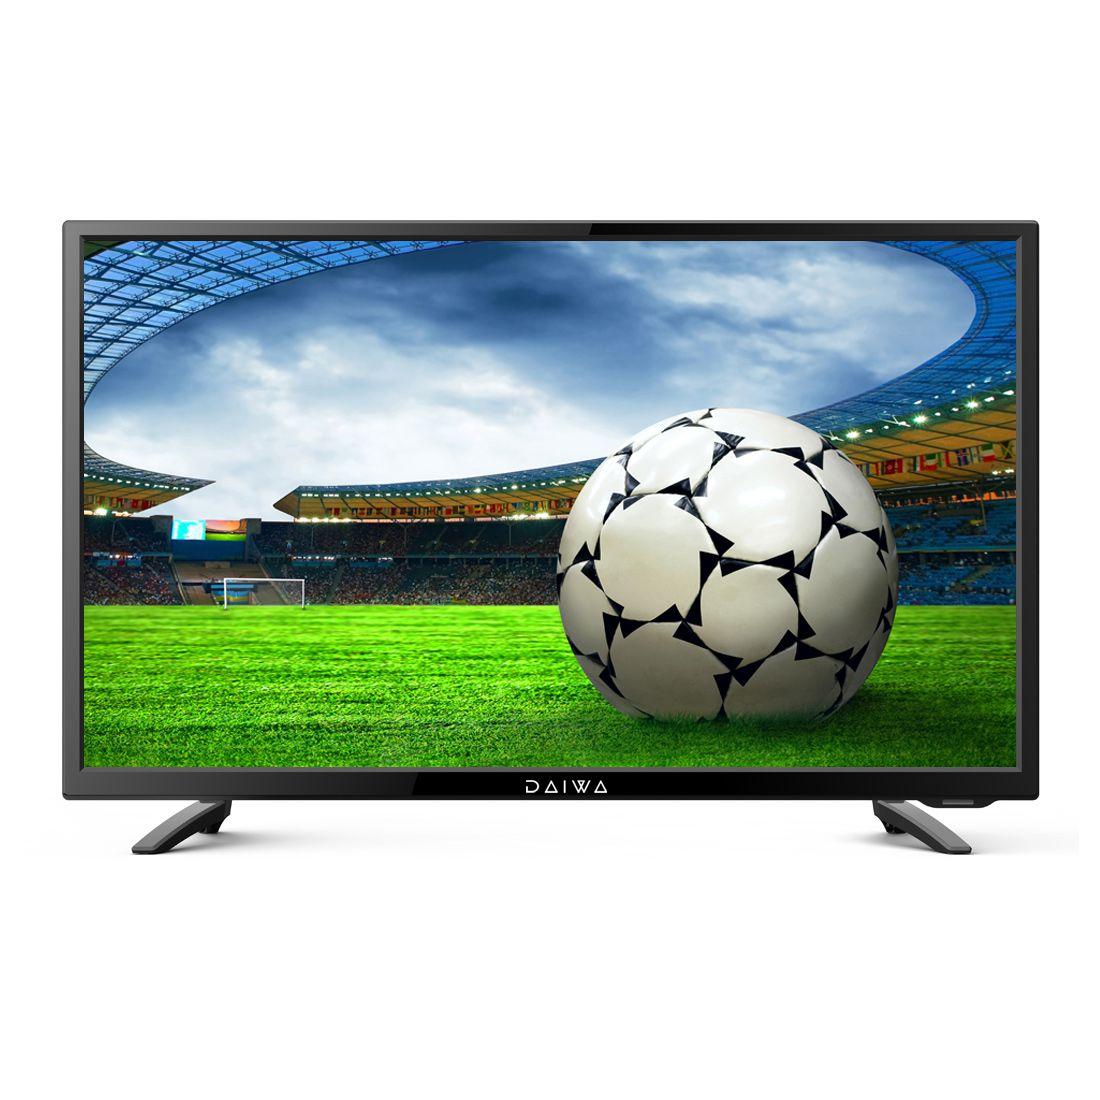 Daiwa D32E1 80 cm ( 32 ) HD Ready (HDR) LED Television